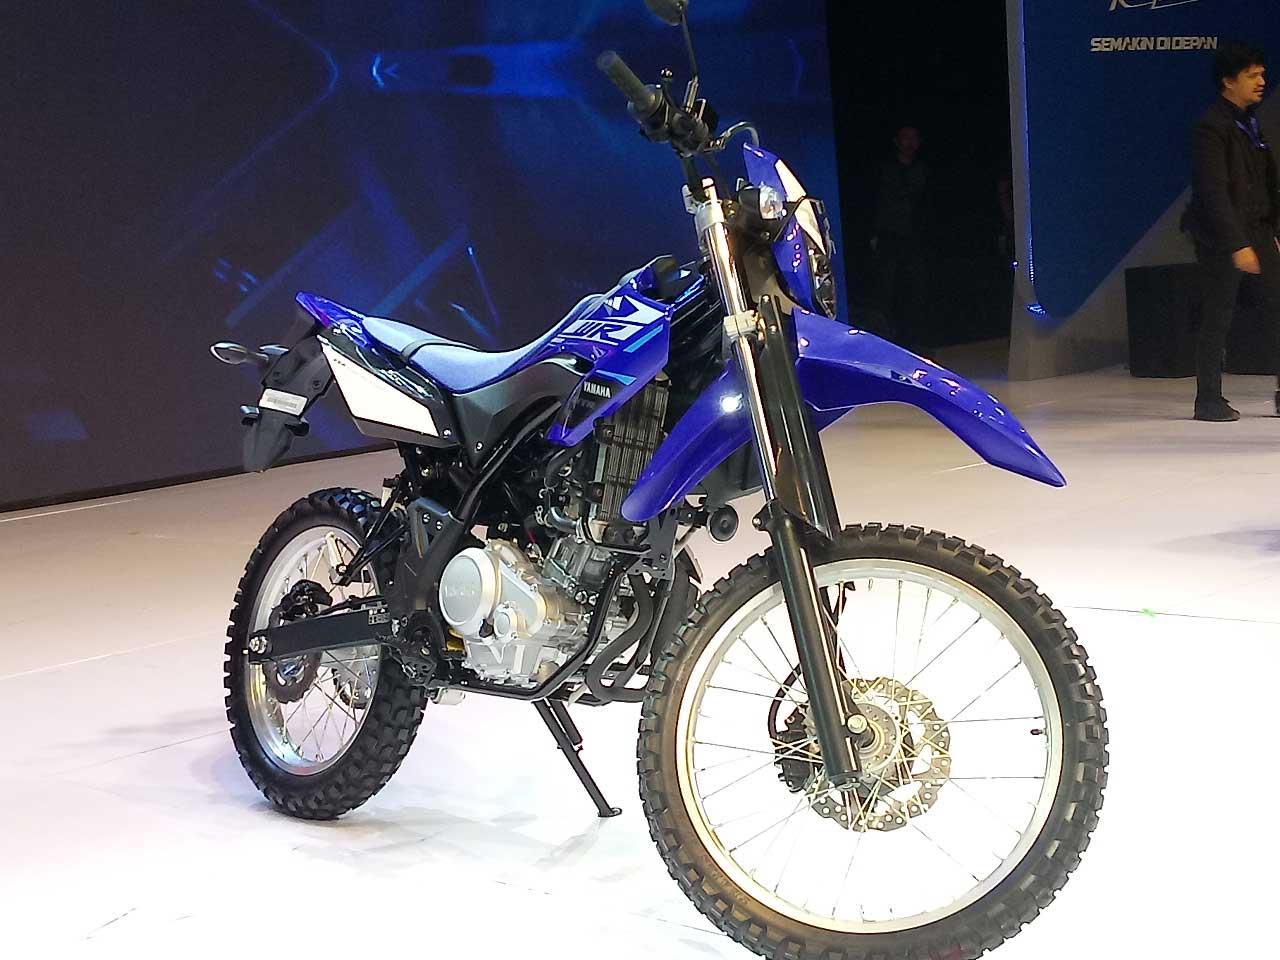 Harga-Yamaha-WR-155R-Tahun-2020,-OTR-Jatim-Tembus-39-Jutaan